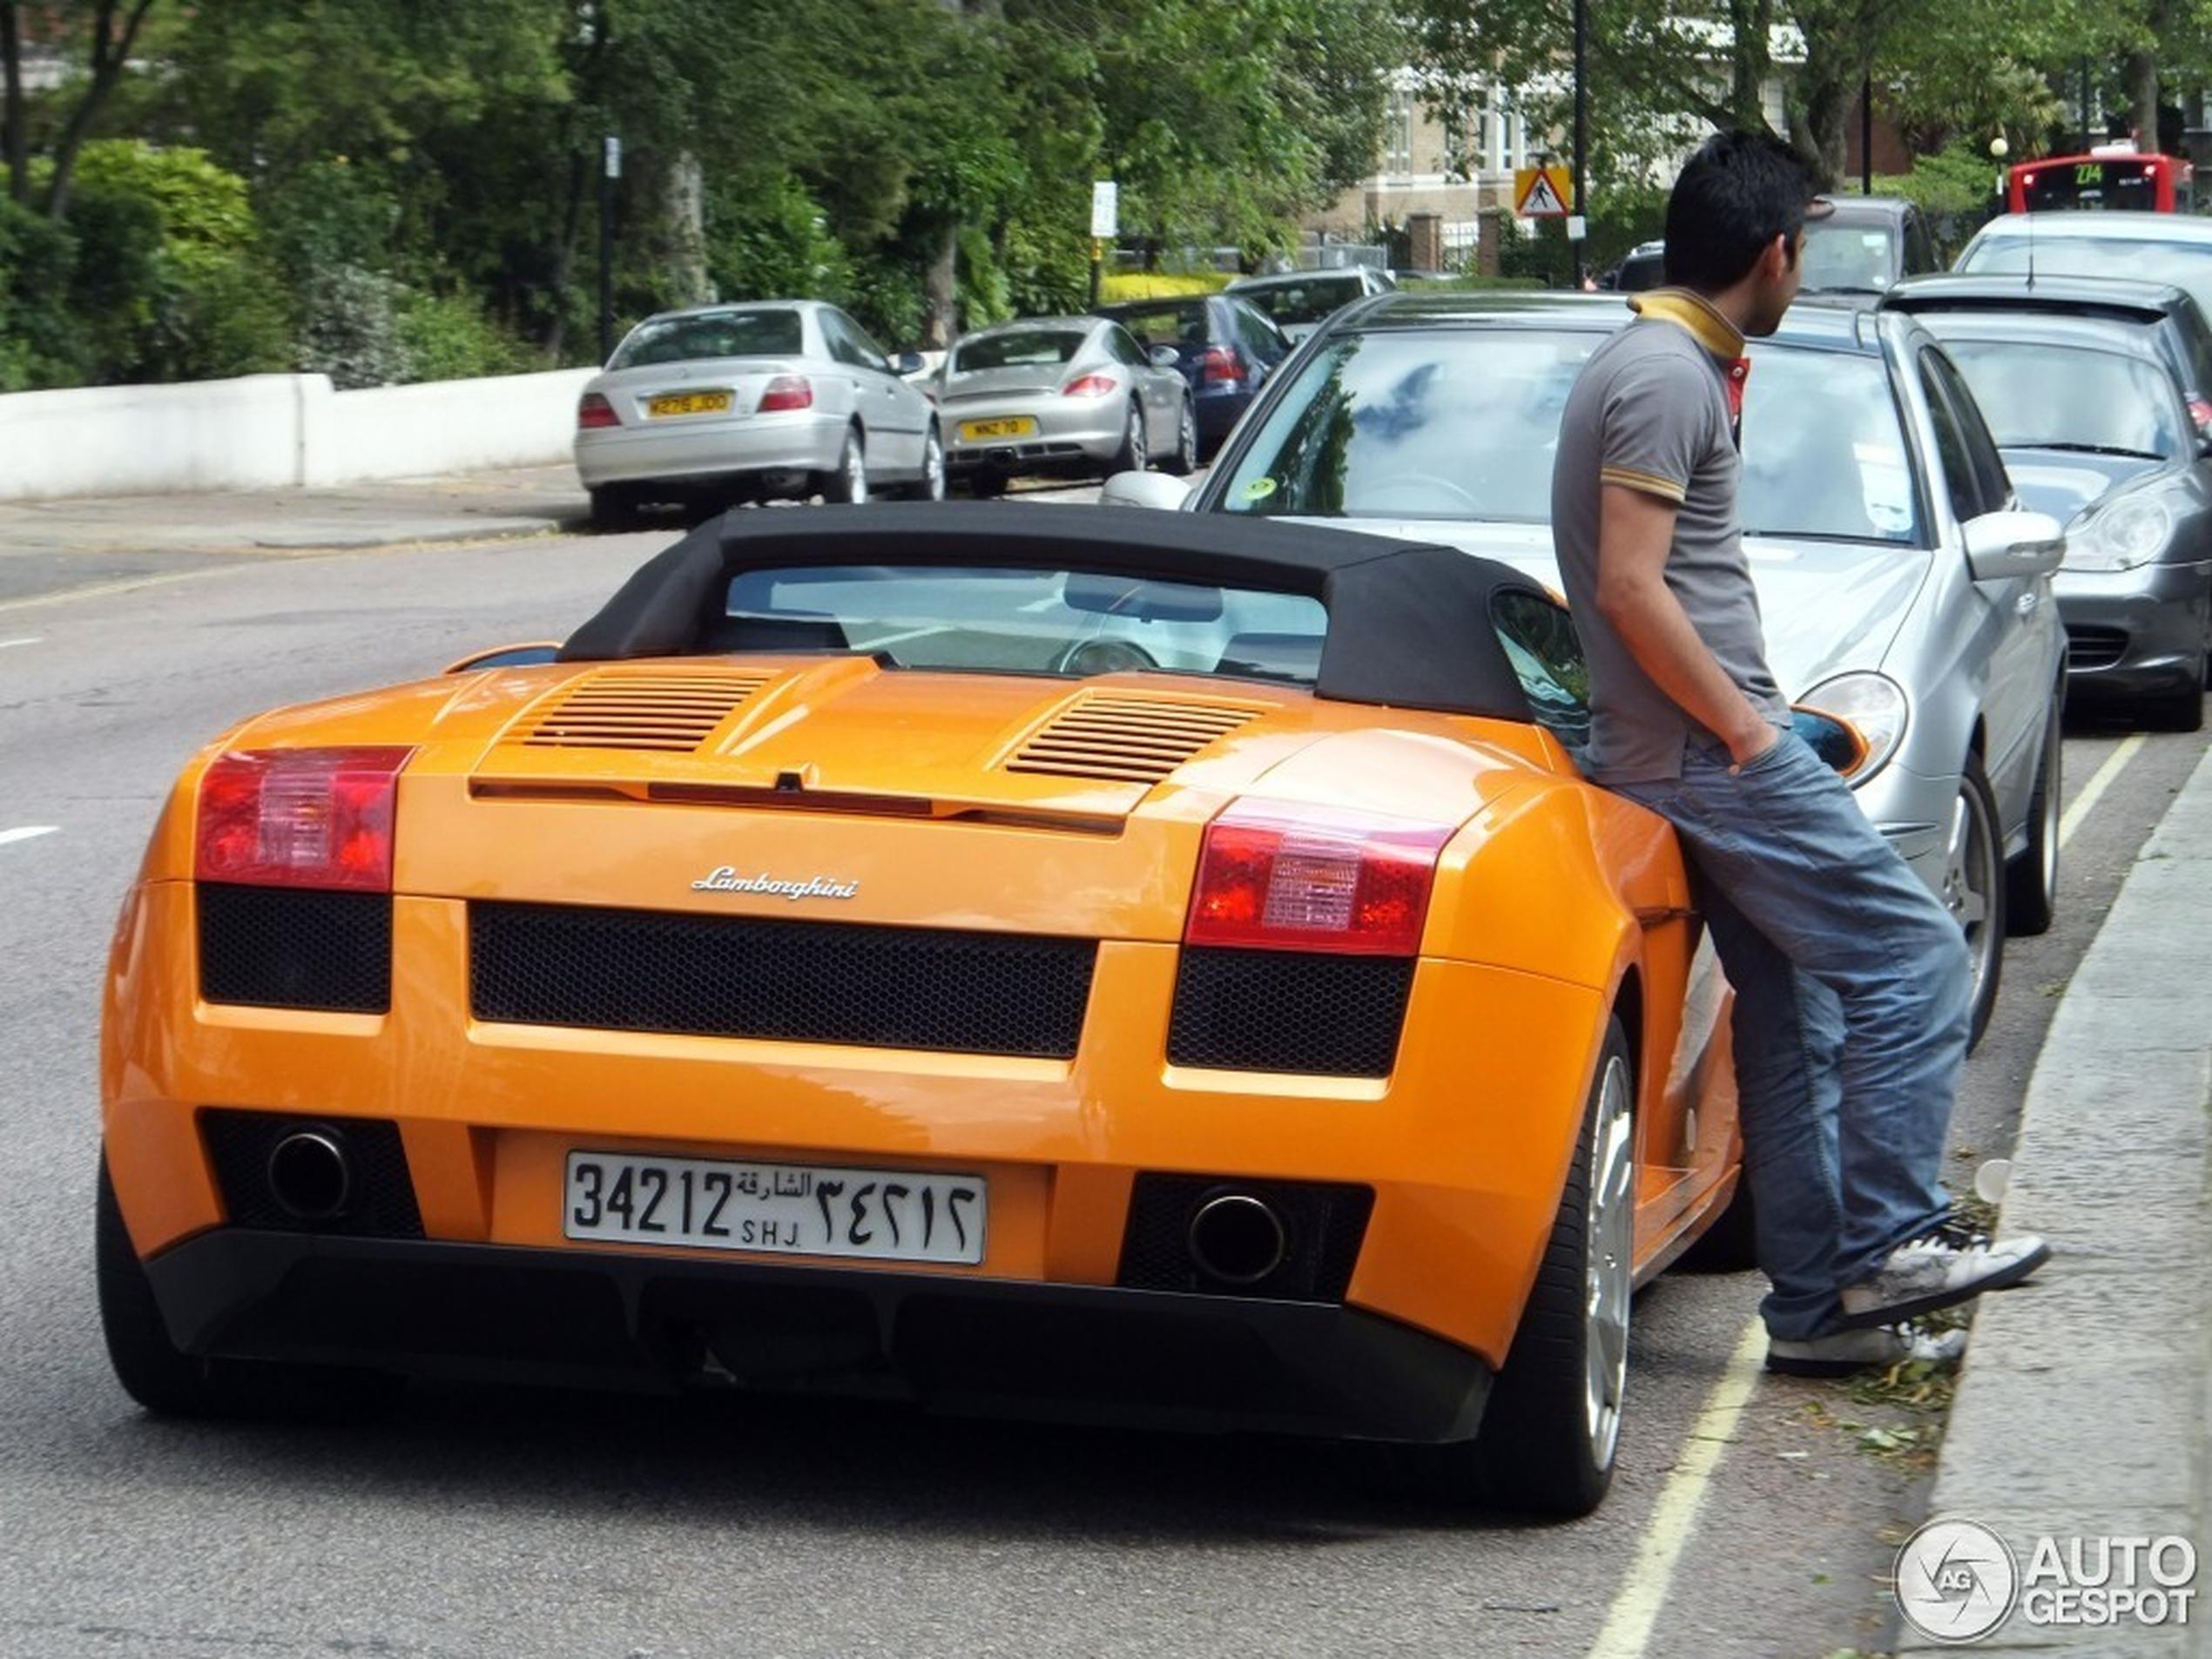 Lamborghini Gallardo Spyder 17 June 2012 Autogespot